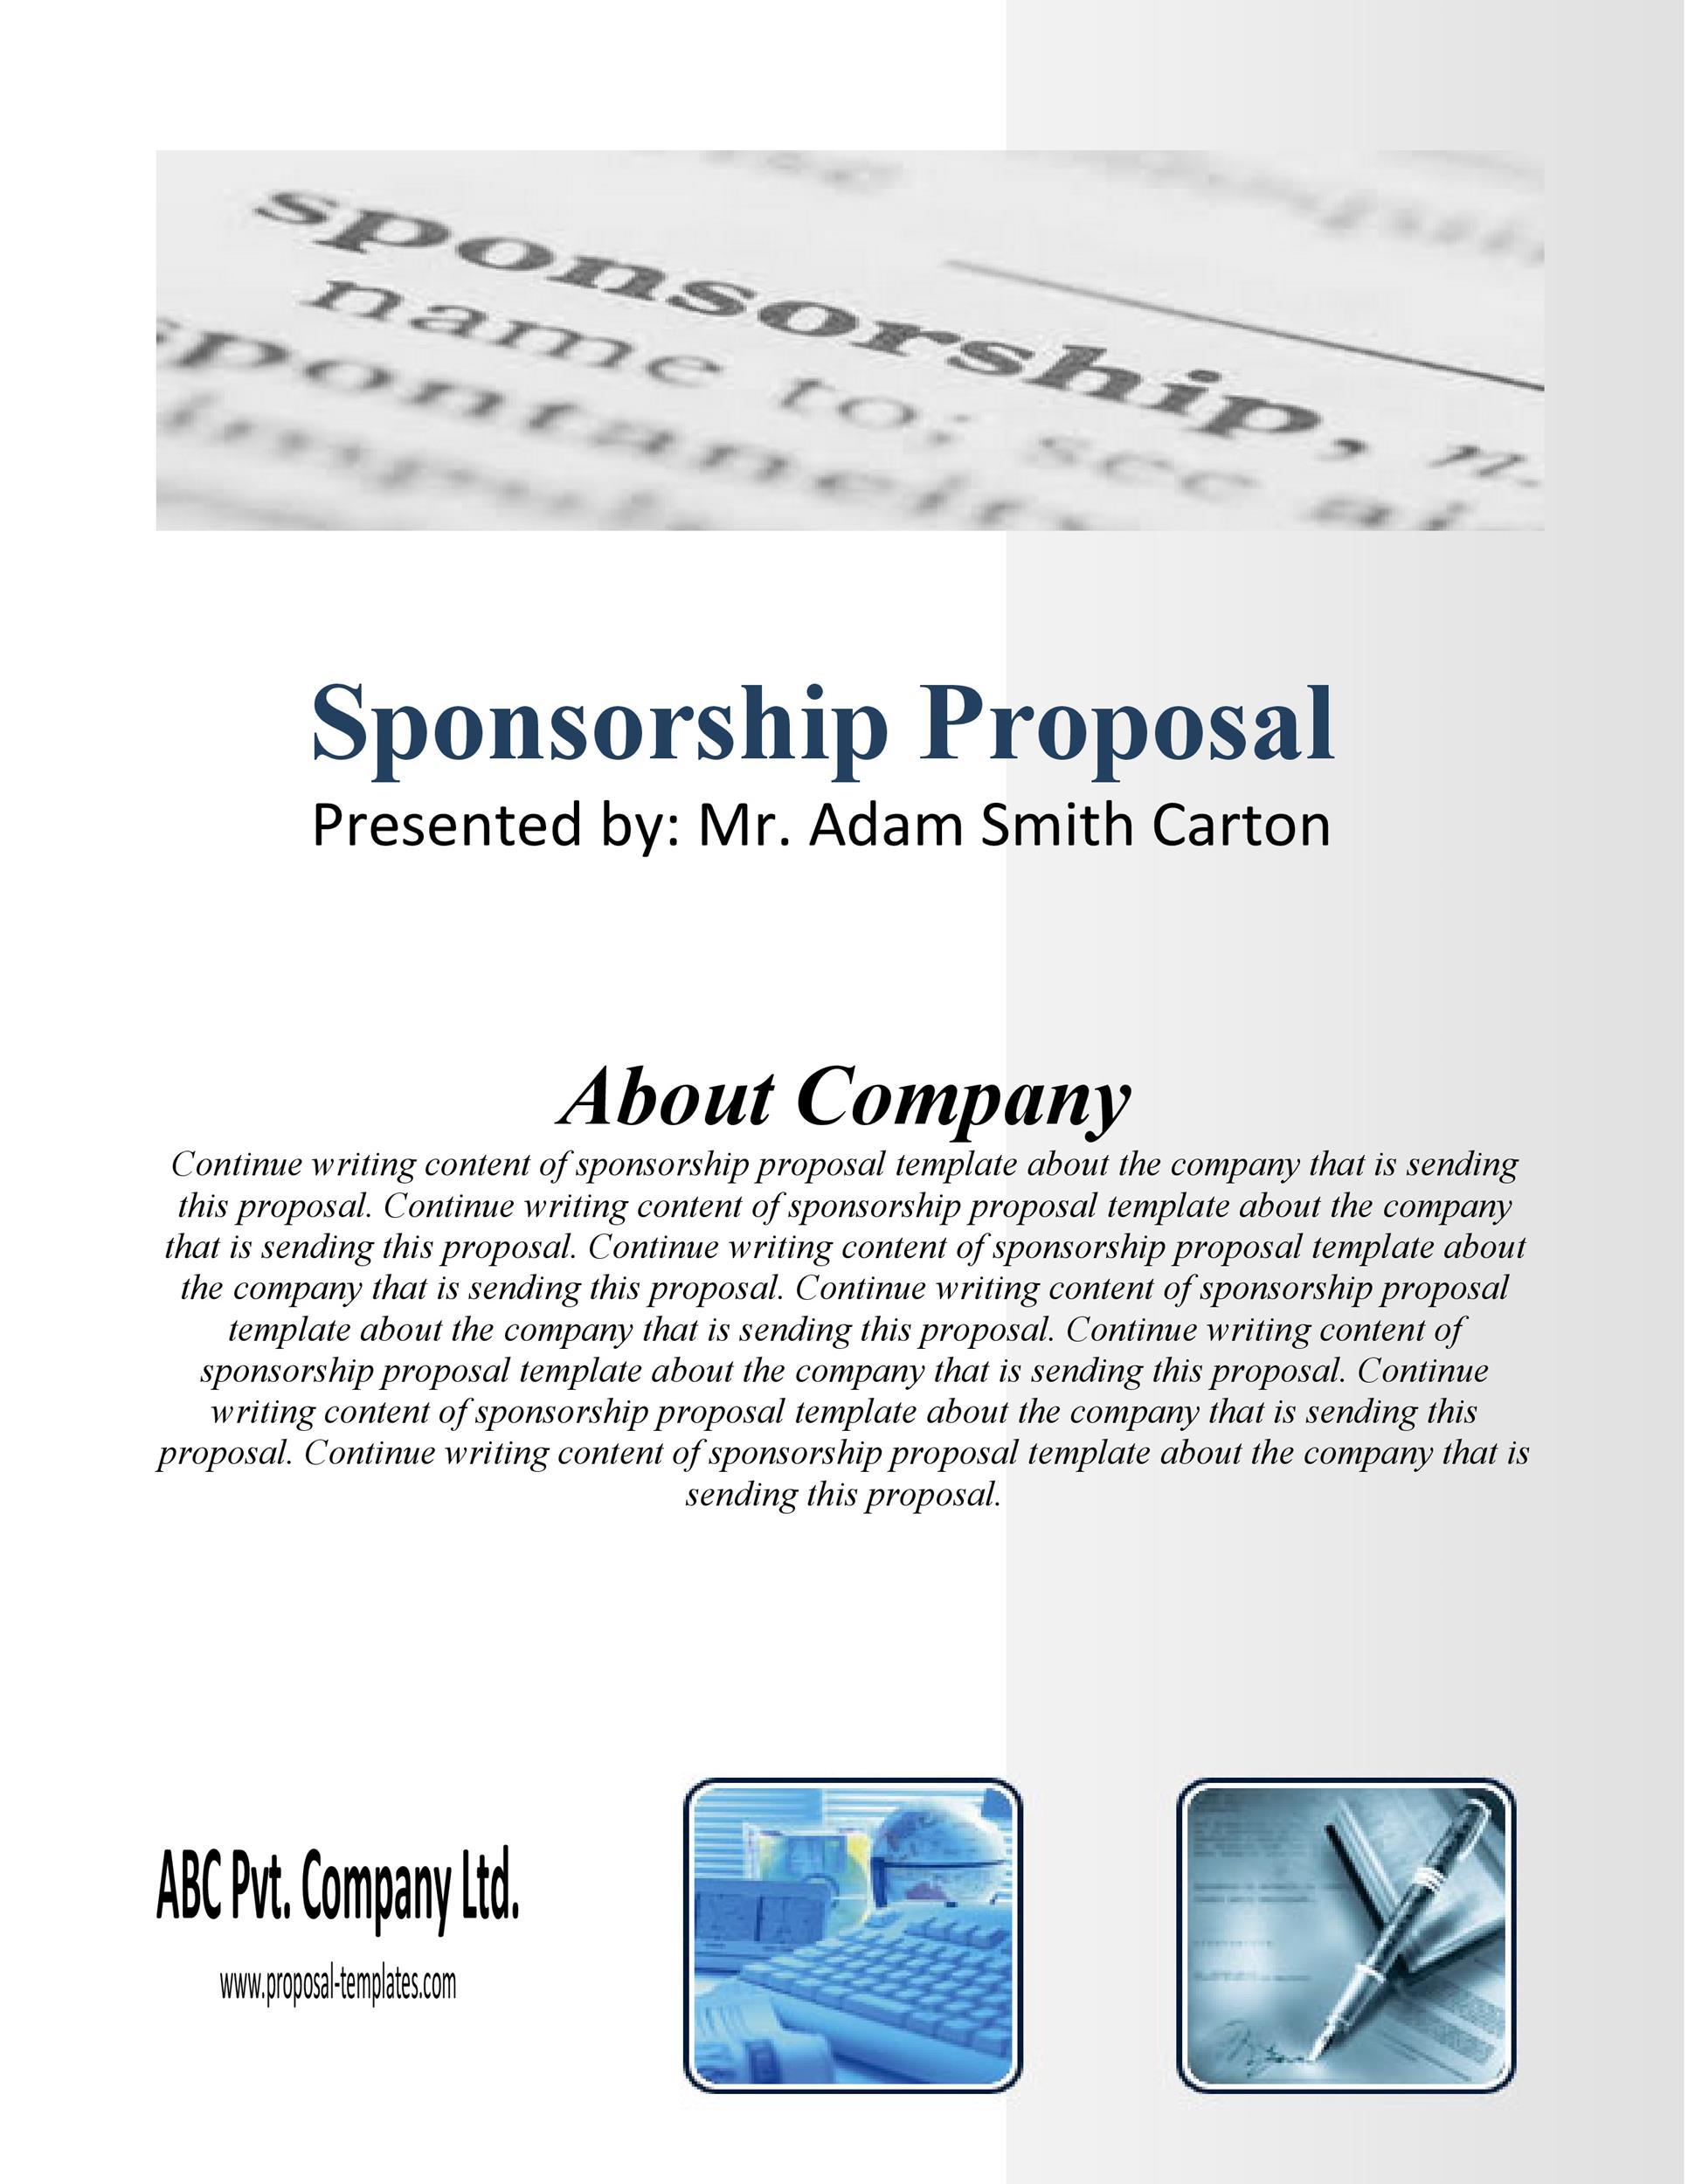 40+ Sponsorship Letter  Sponsorship Proposal Templates - example sponsorship proposal